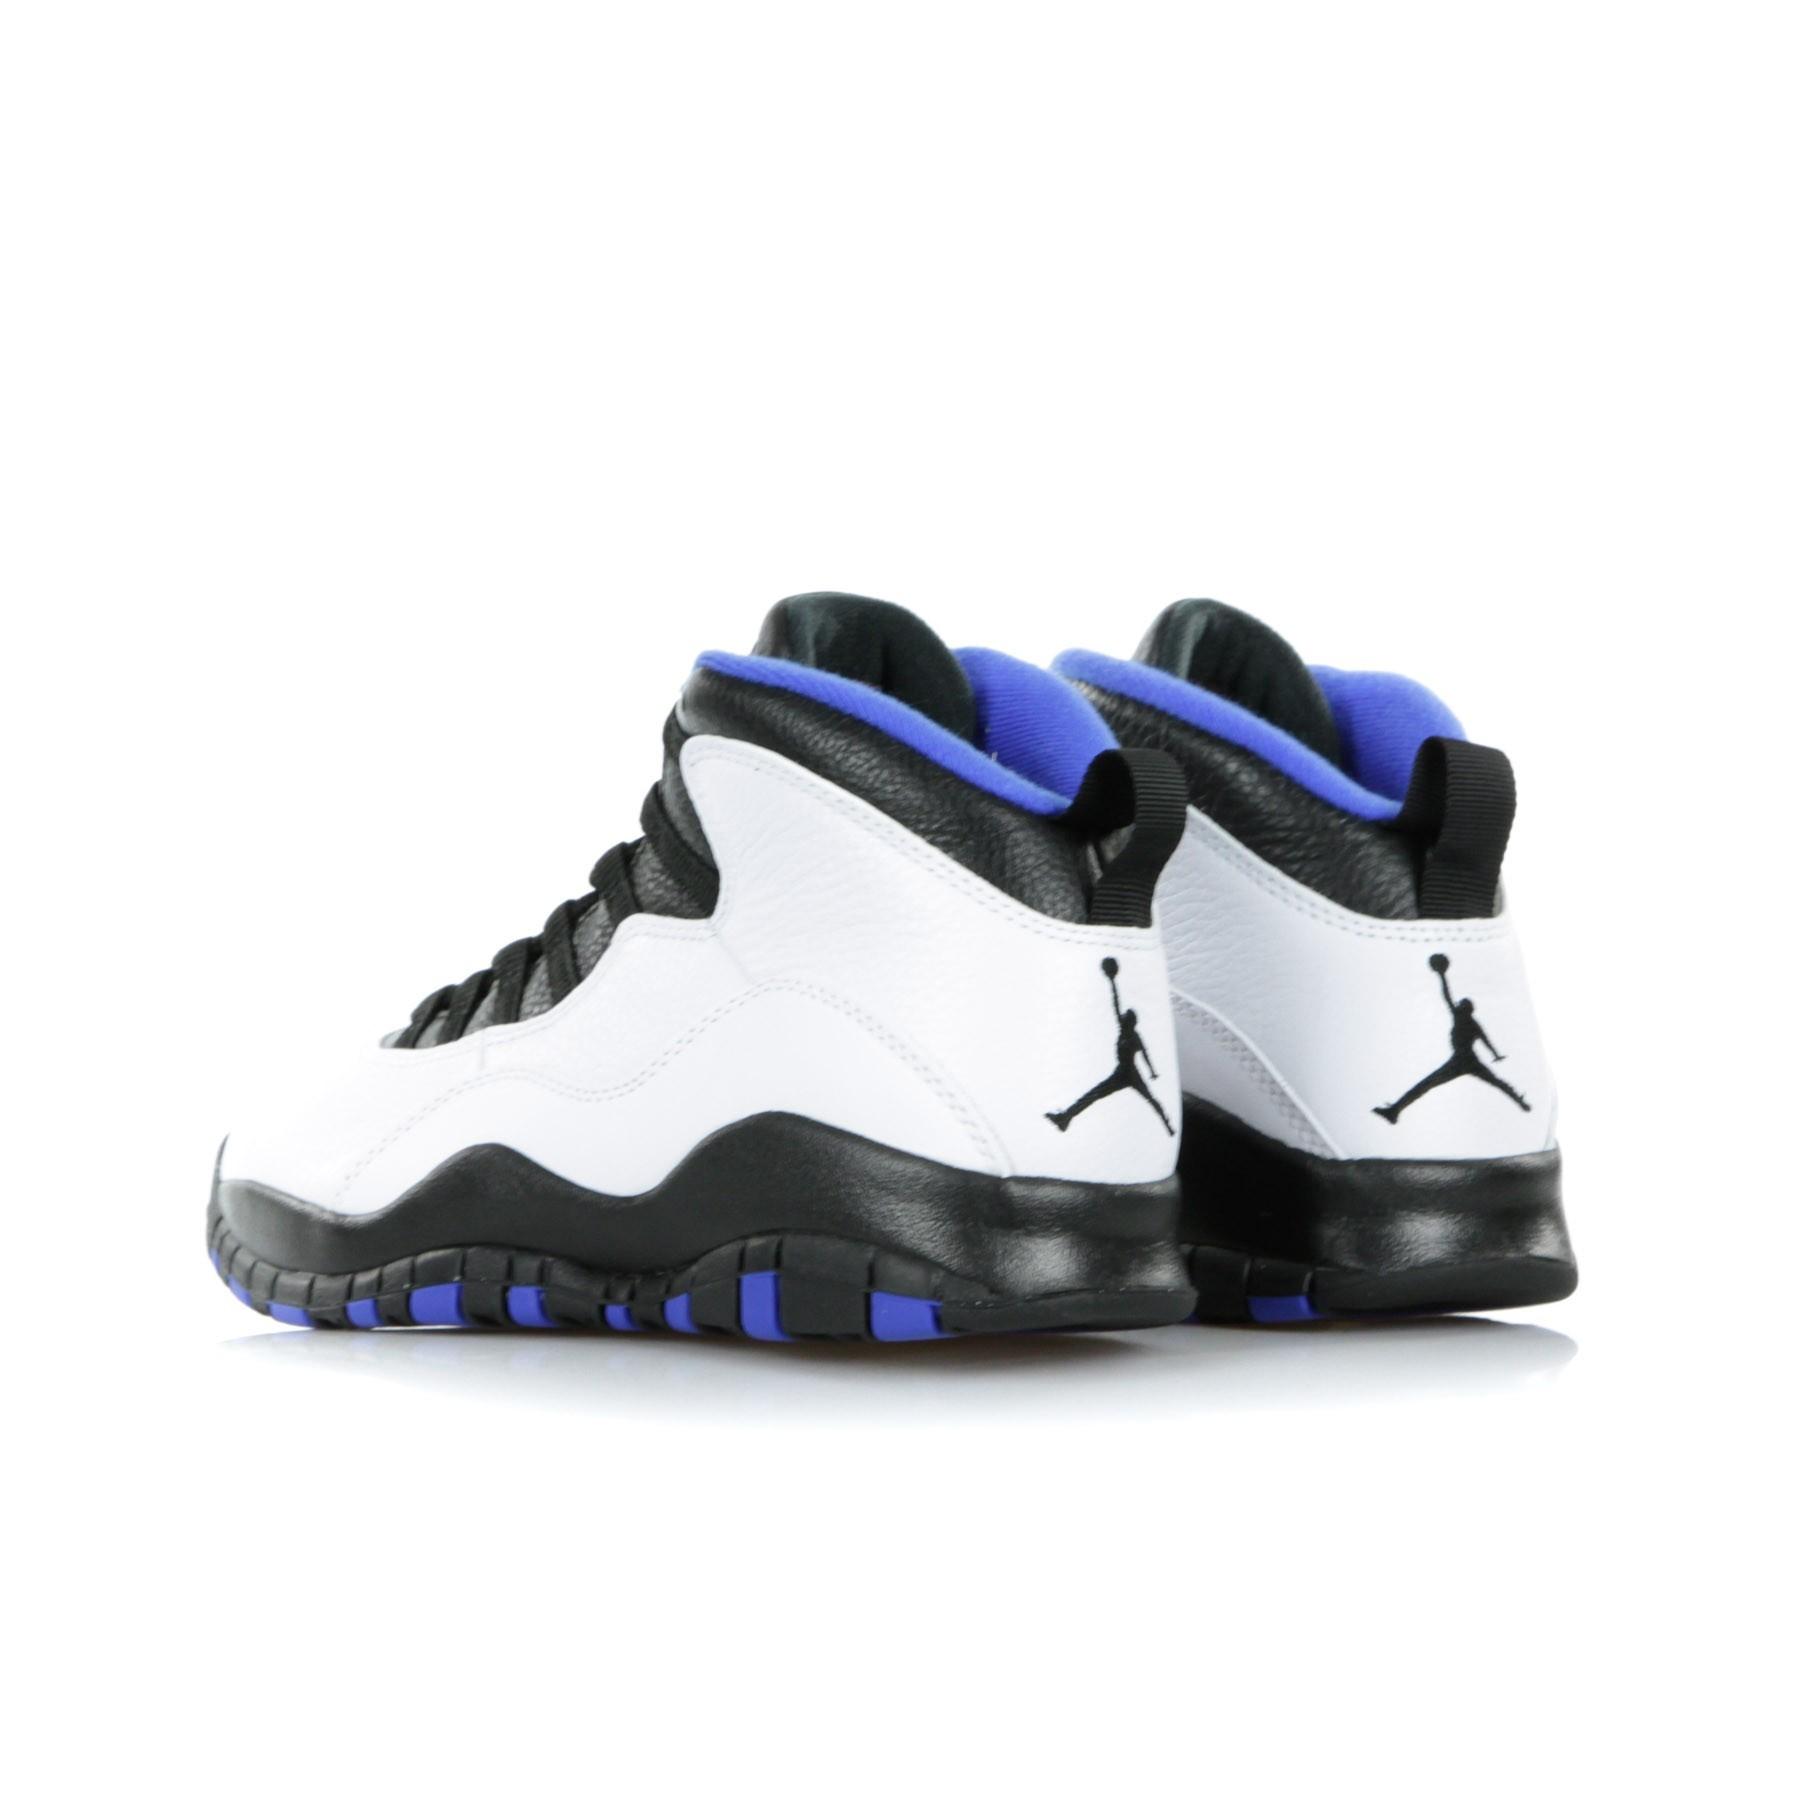 ... italy high shoe air jordan 10 retro orlando 85a22 9a82f 5afd90afe